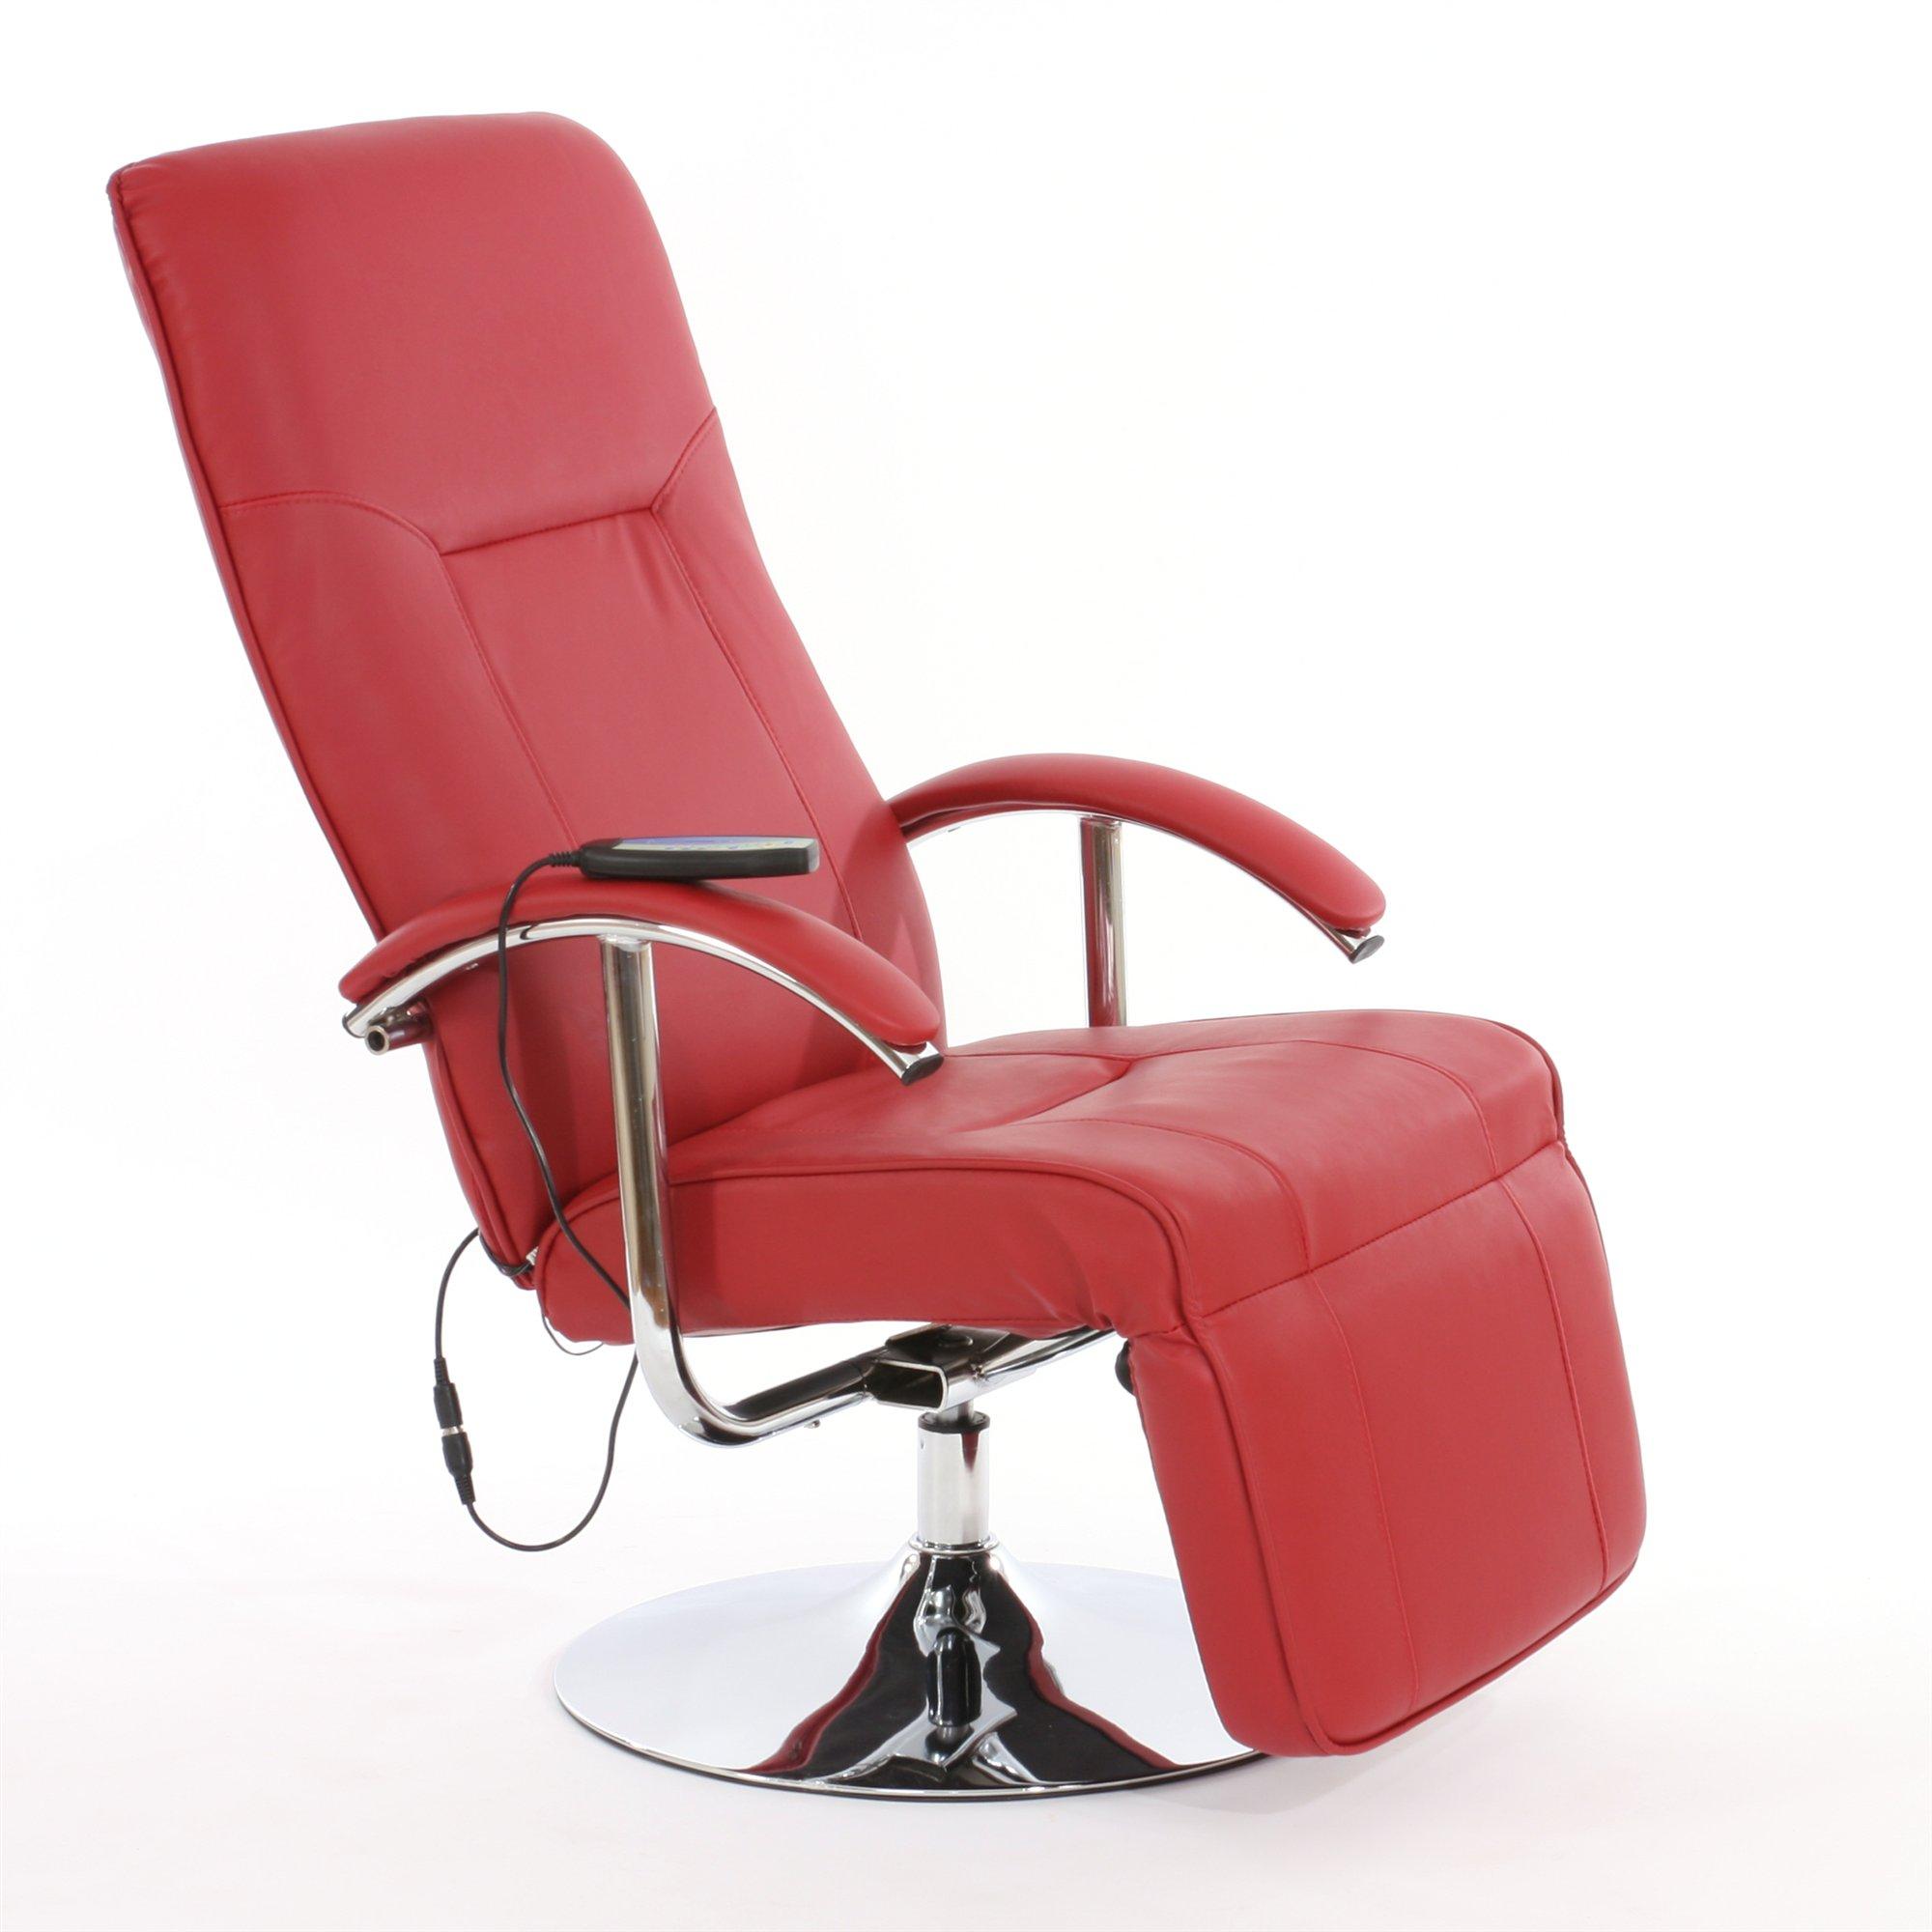 Sill n el ctrico reclinable apia ii con funci n masaje - Sillon reclinable piel ...